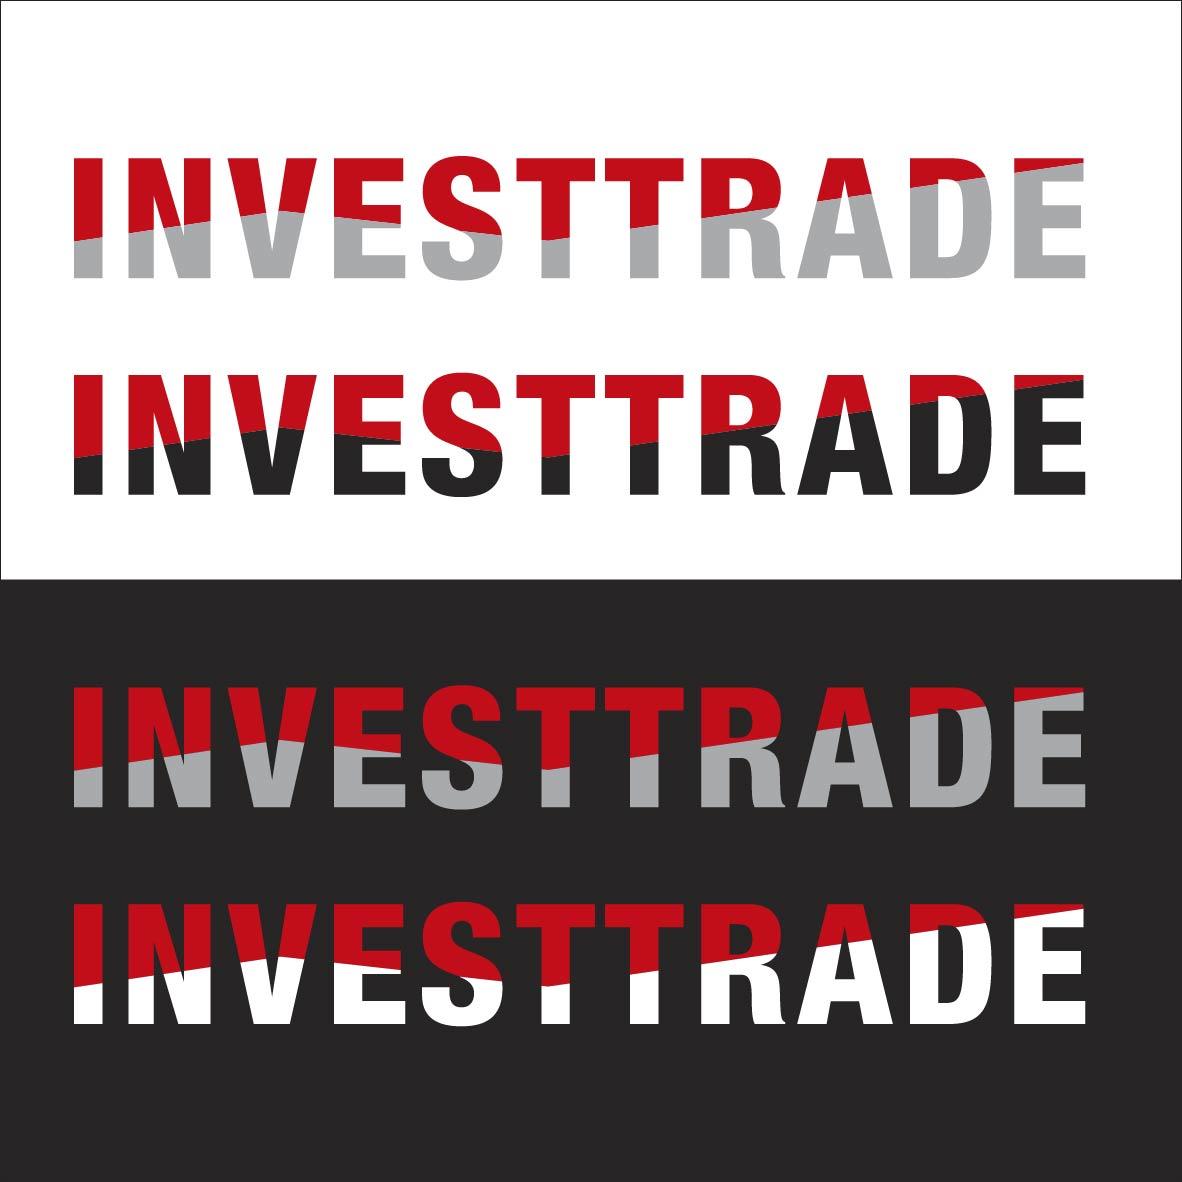 Разработка логотипа для компании Invest trade фото f_0515133a98895202.jpg